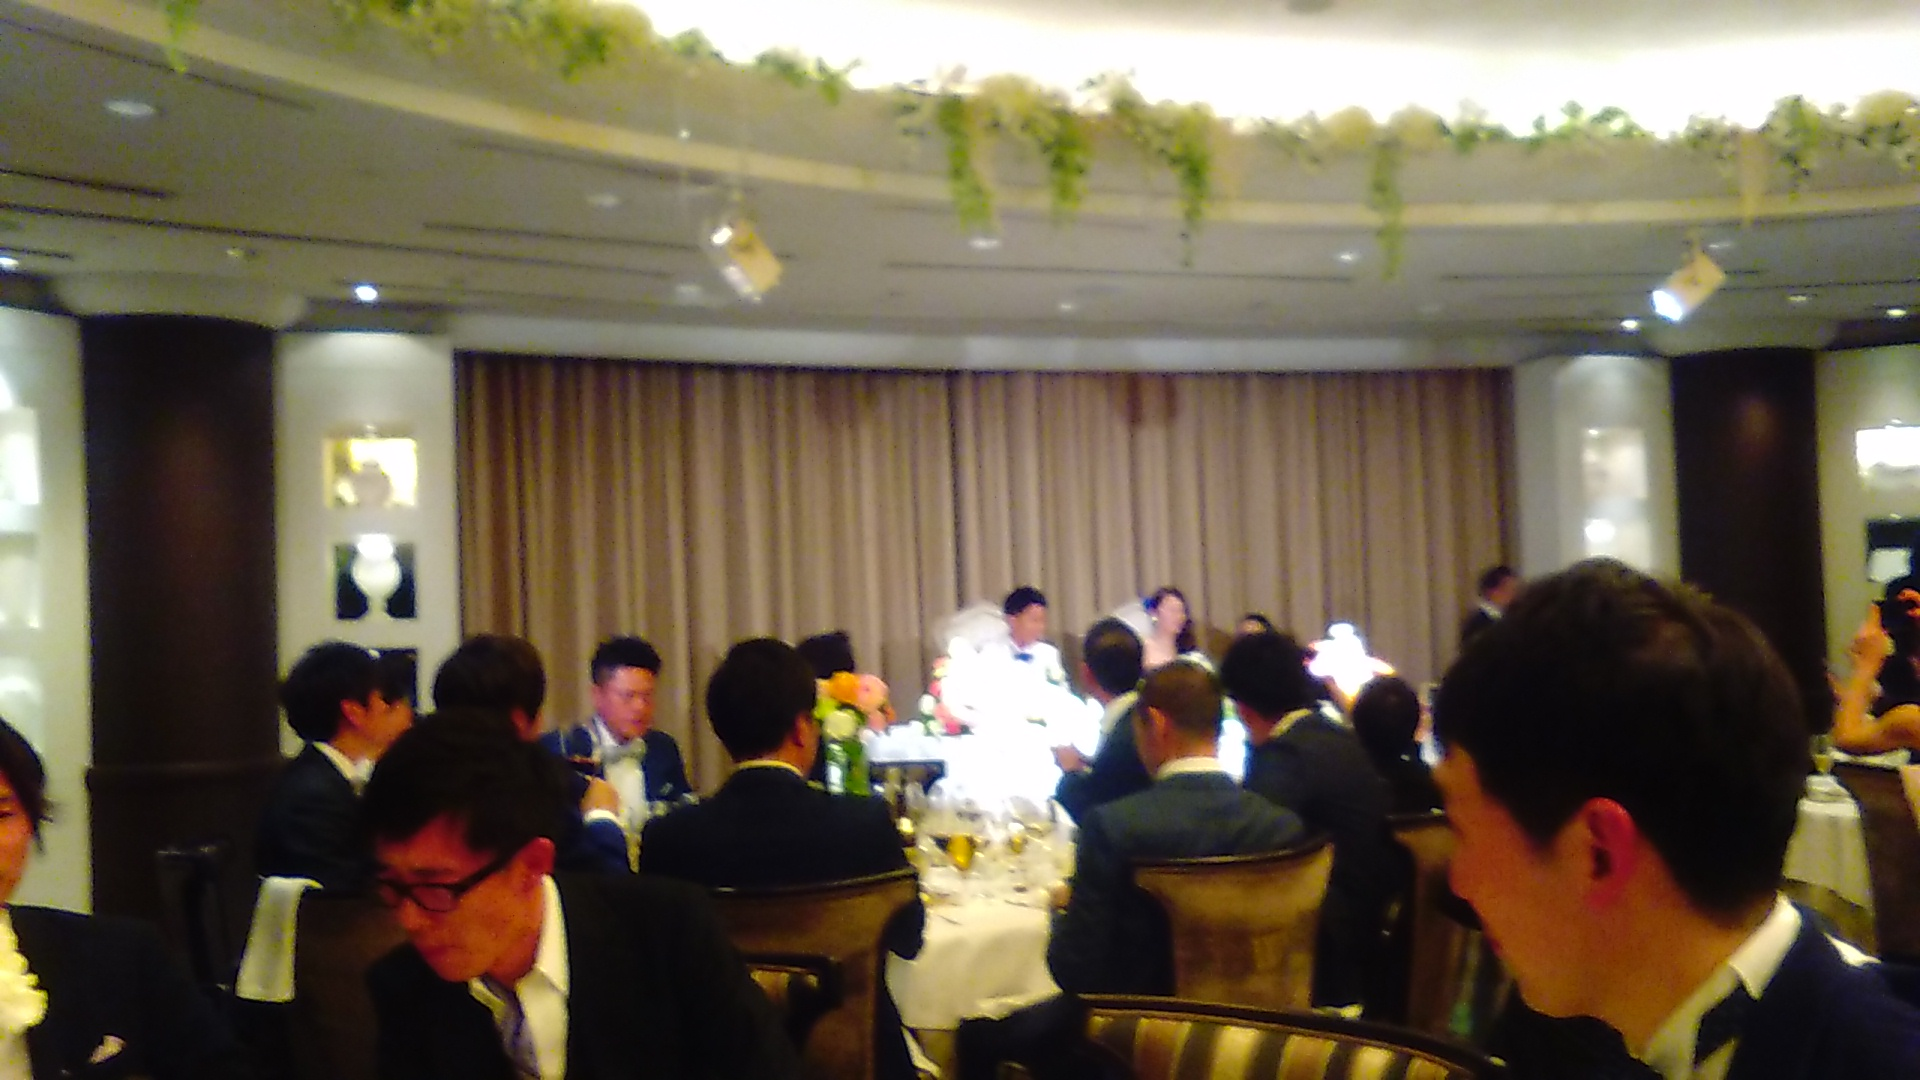 KIMG0673 - 結婚式